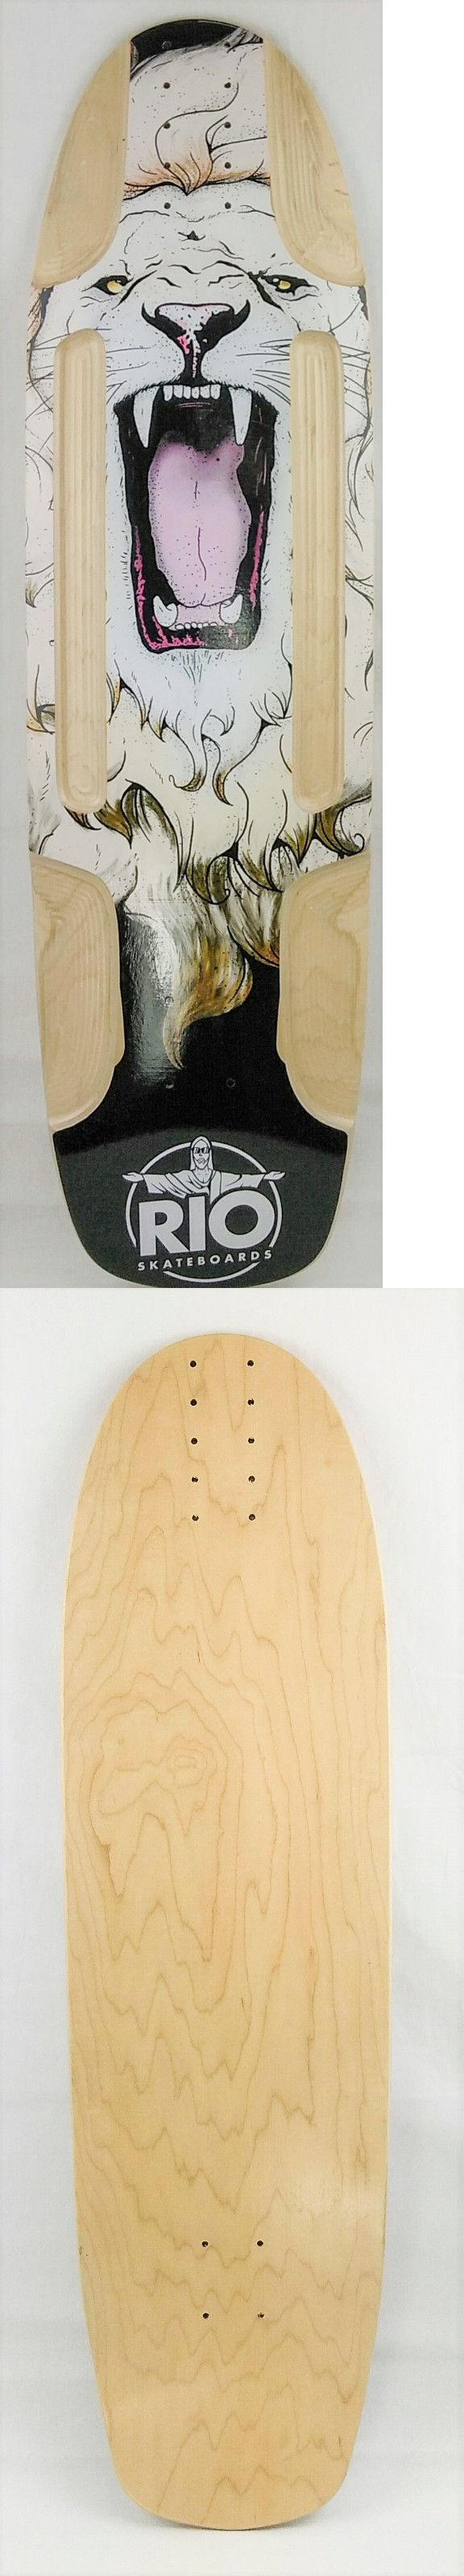 Decks 165944: Longboard Freeride Cruiser High Quality Skateboard 8Ply, 9.5 X 34 Lion D08 -> BUY IT NOW ONLY: $34.99 on eBay!